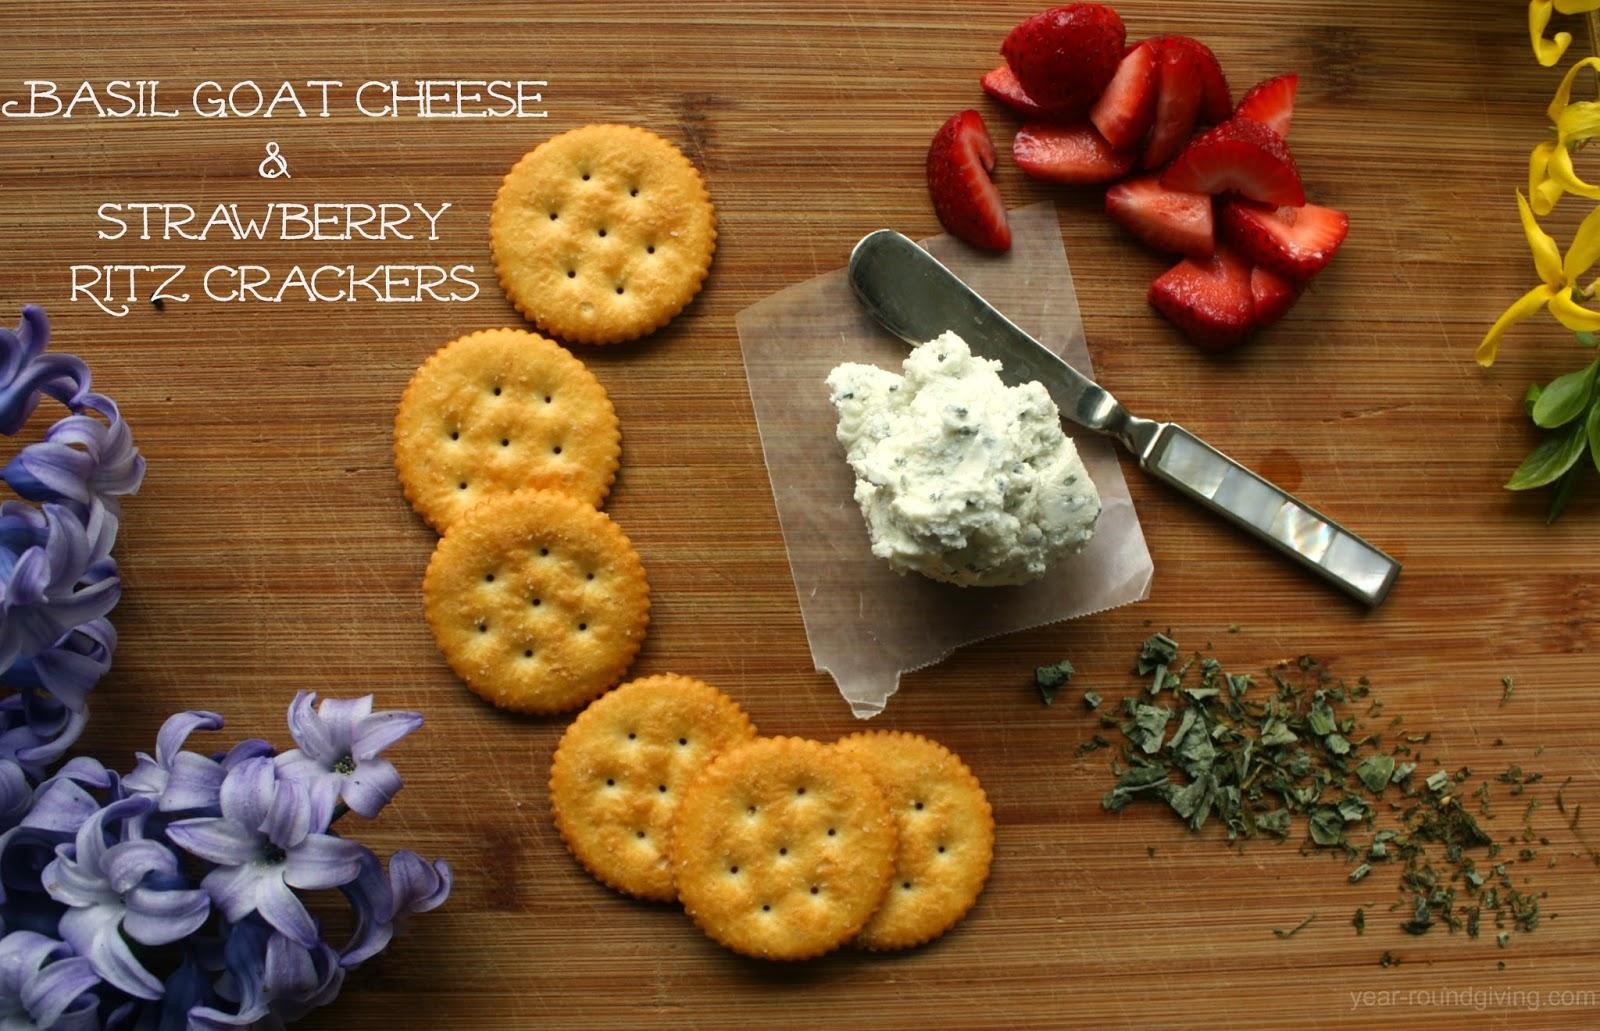 Basil Goat Cheese & Strawberry Ritz Crackers